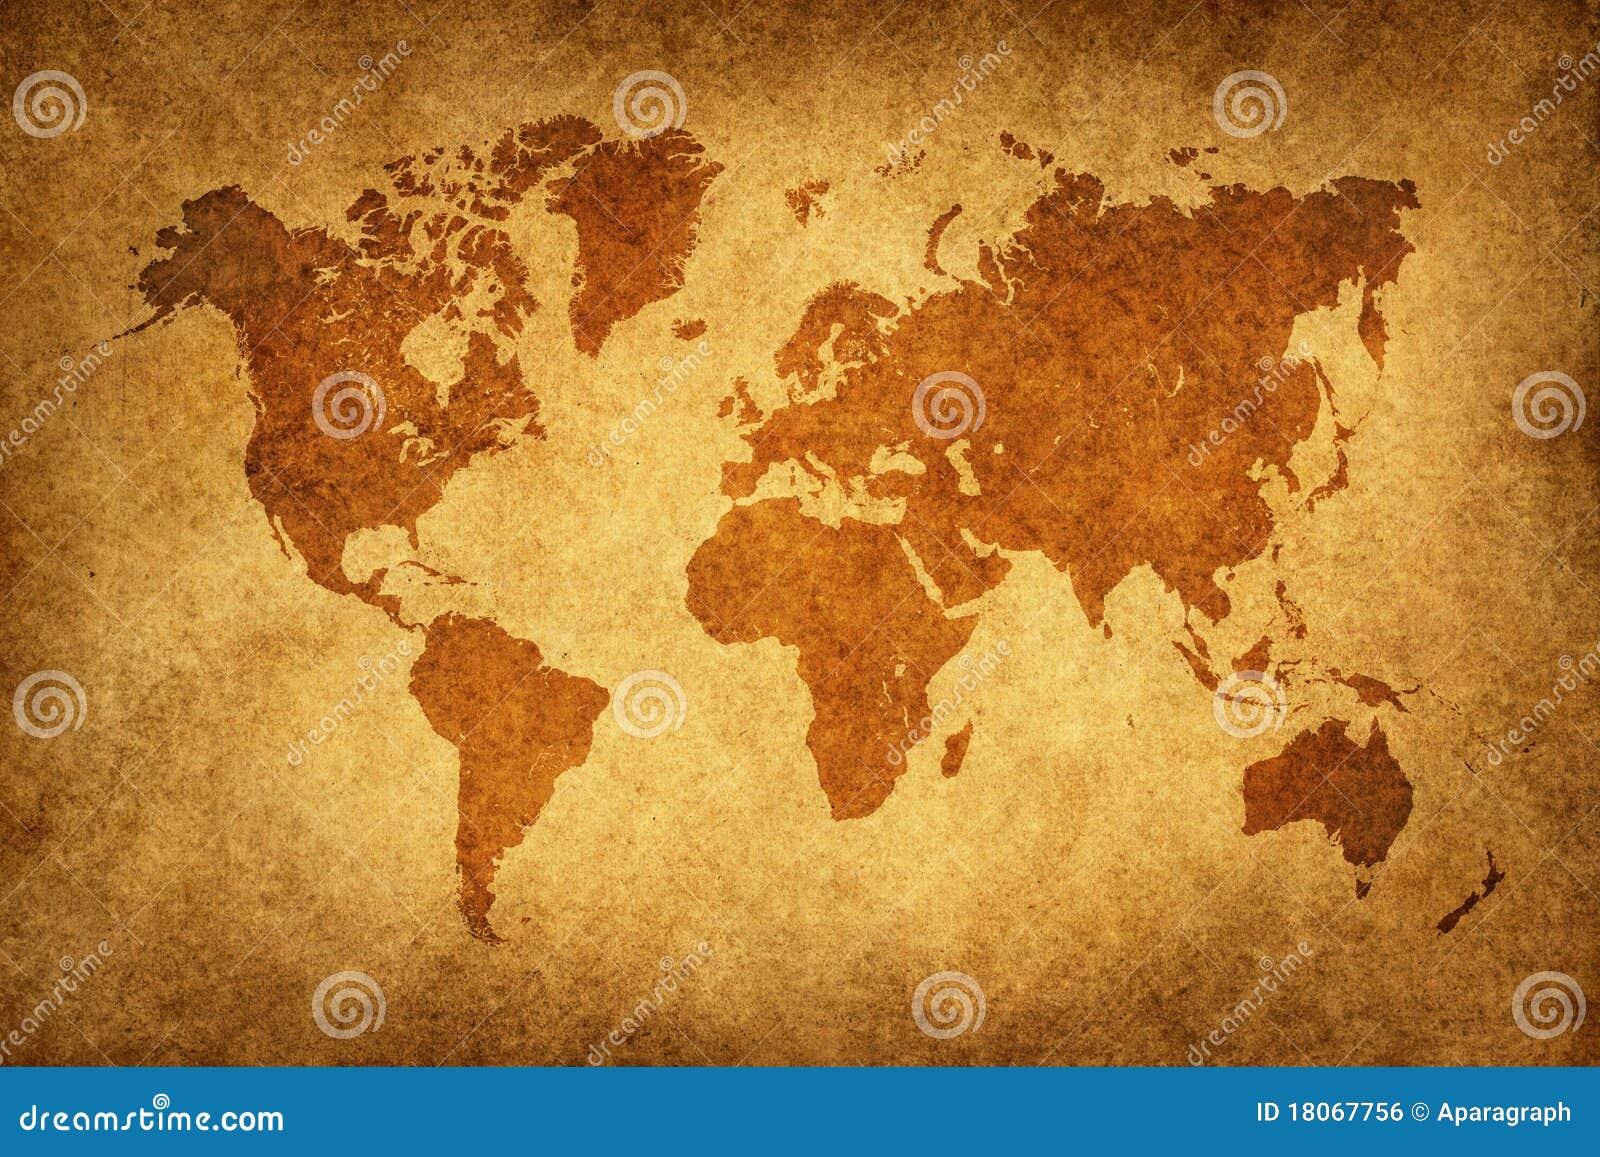 World Map In Vintage Pattern Stock Illustration - Illustration of ...